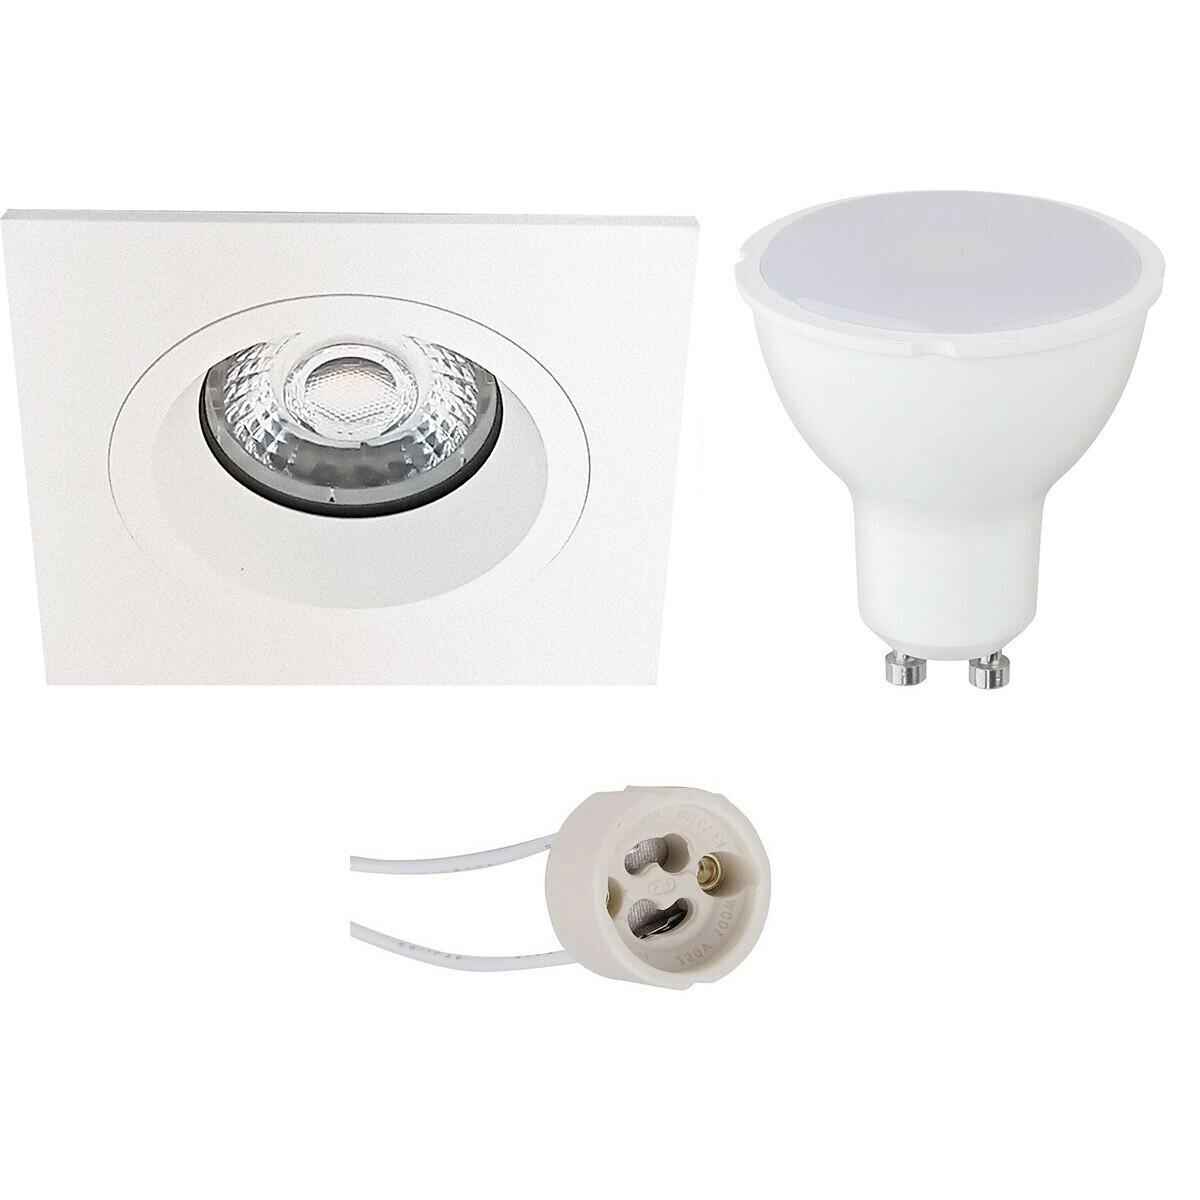 LED Spot Set - Pragmi Rodos Pro - GU10 Fitting - Inbouw Vierkant - Mat Wit - 4W - Natuurlijk Wit 420